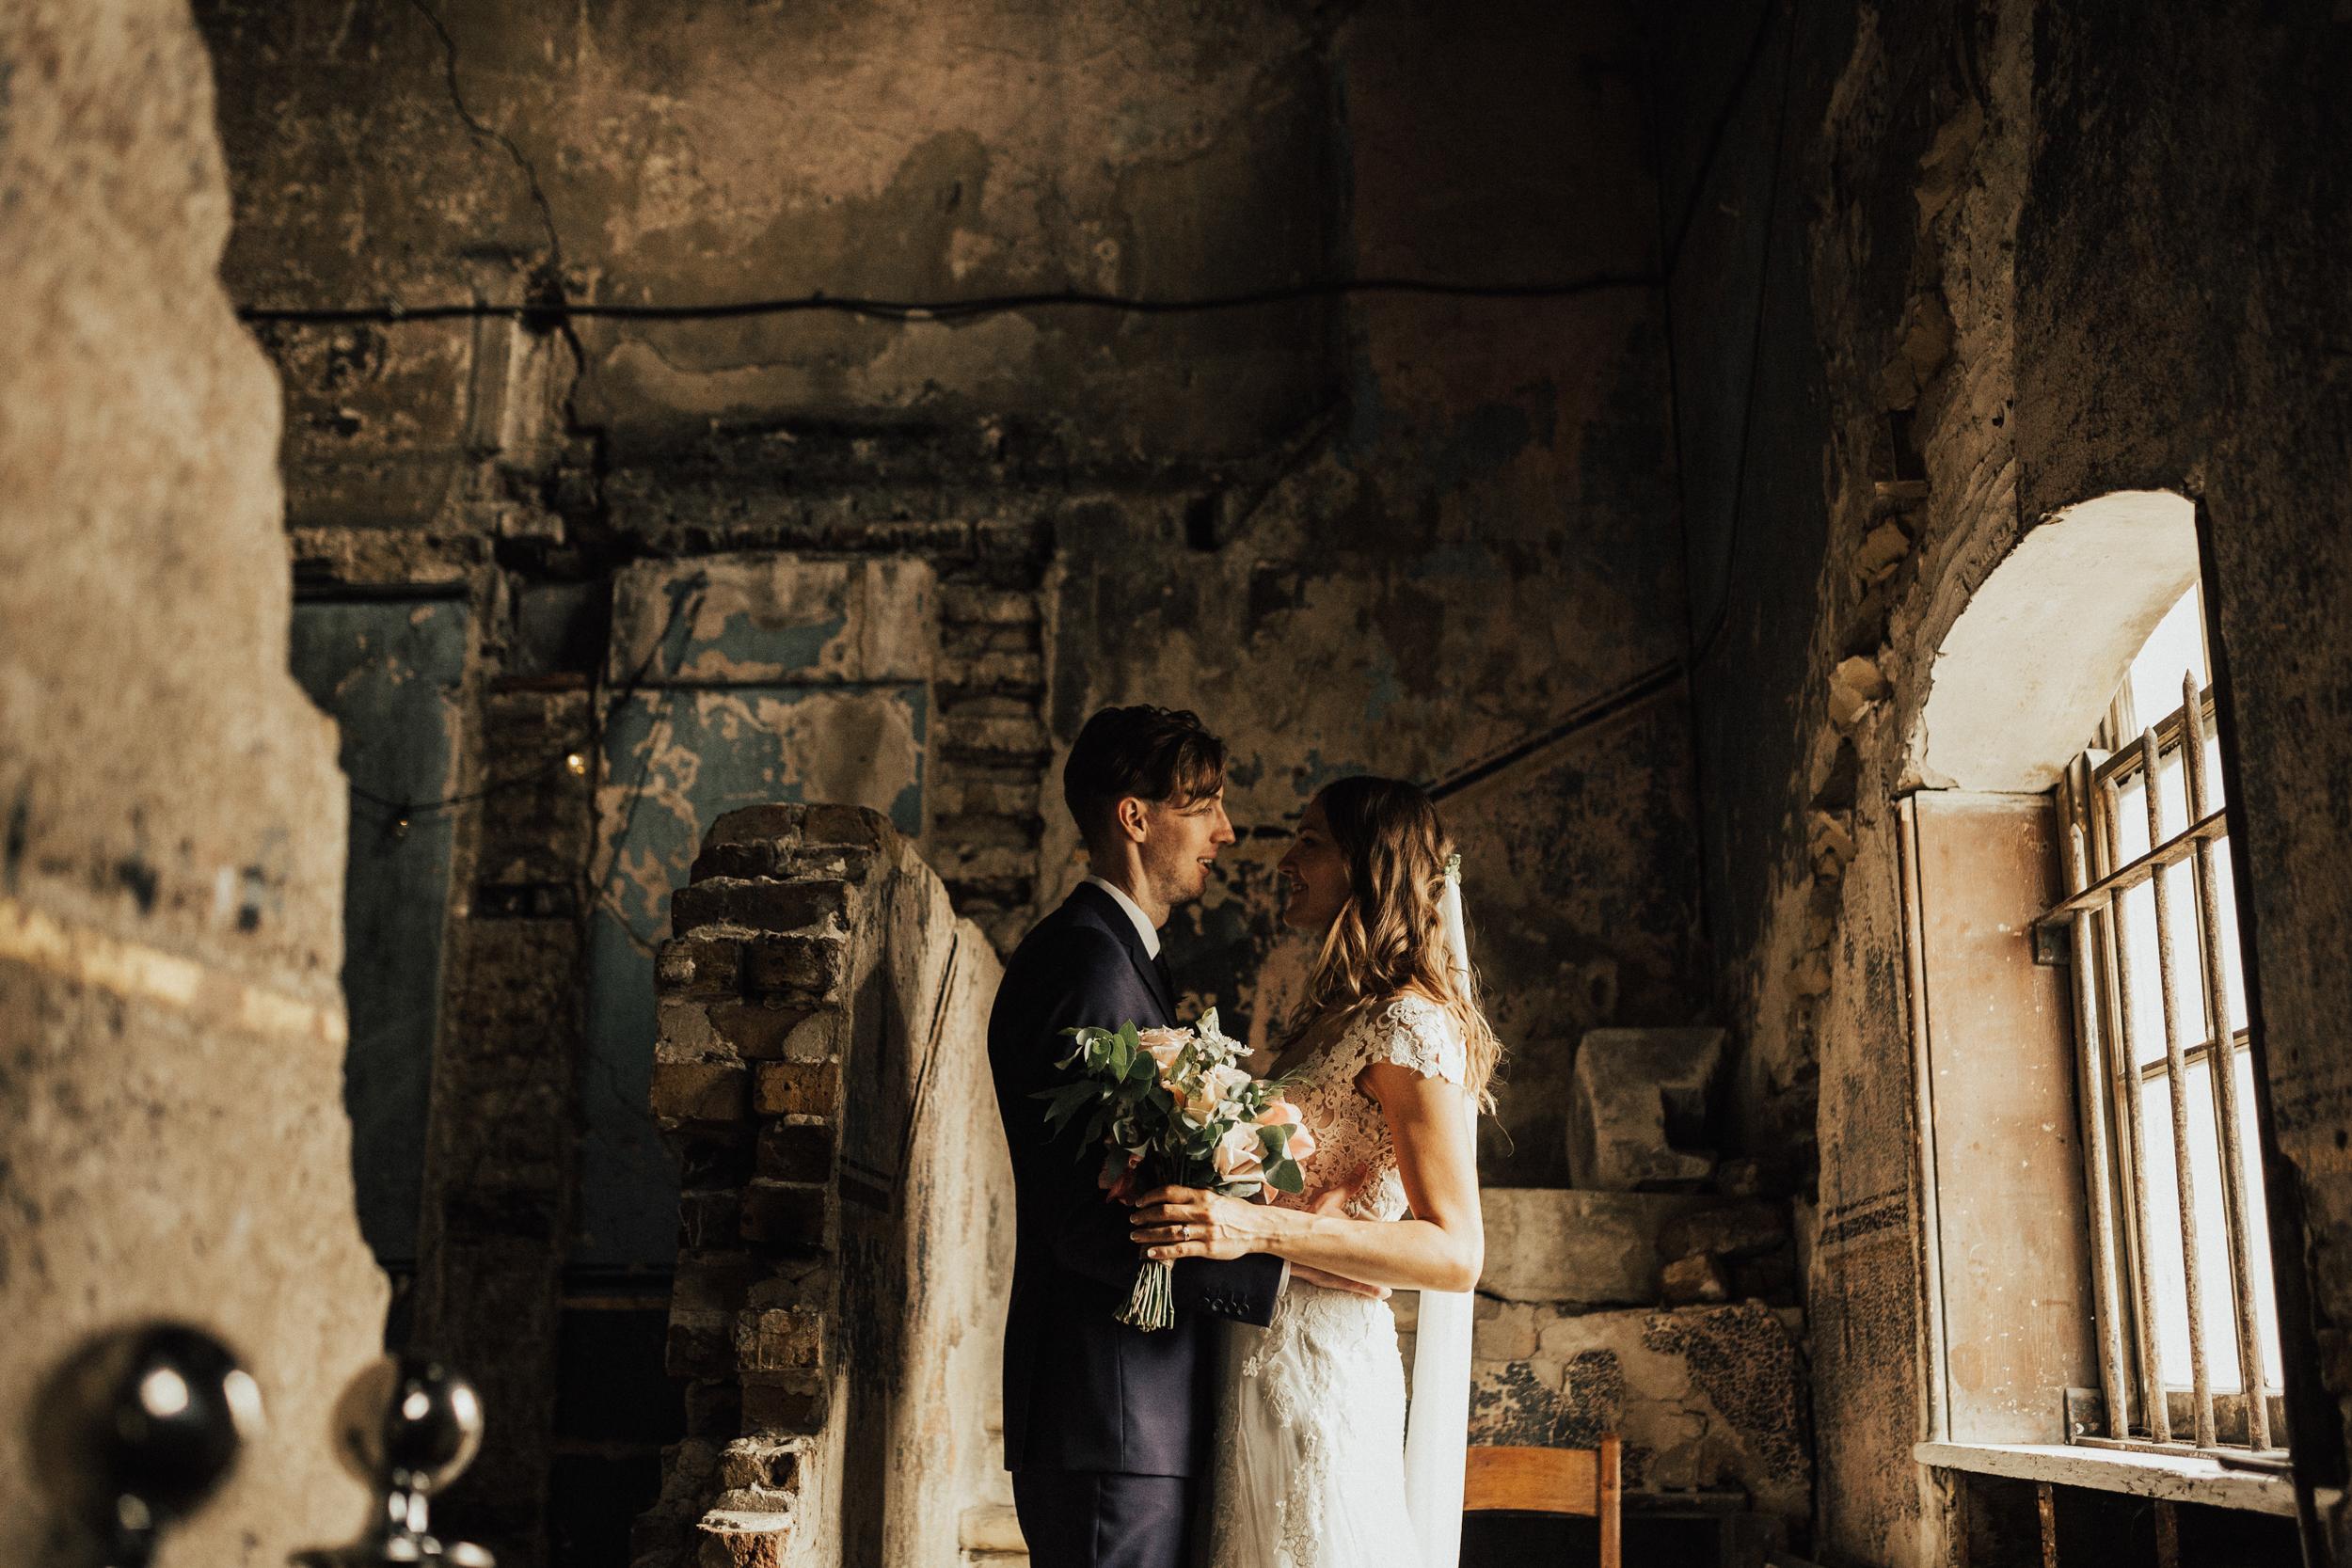 Laura-Benn-The-Asylum-London-The-Ace-Hotel-Wedding-Alternative-Darina-Stoda-Photography-357.jpg